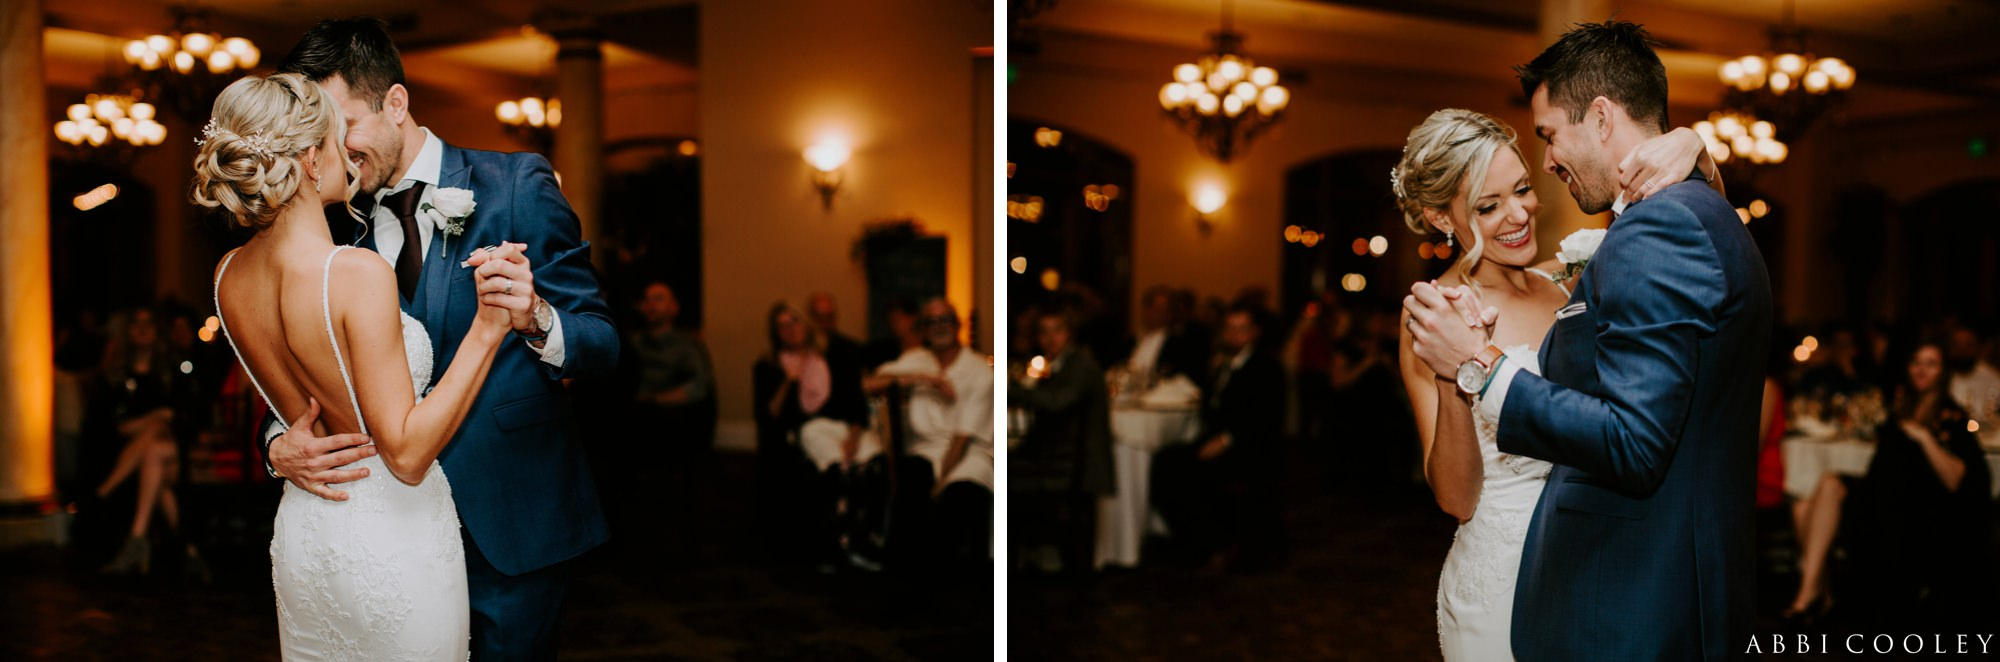 ABBI COOLEY WILSON CREEK WINERY TEMECULA WEDDING_0887